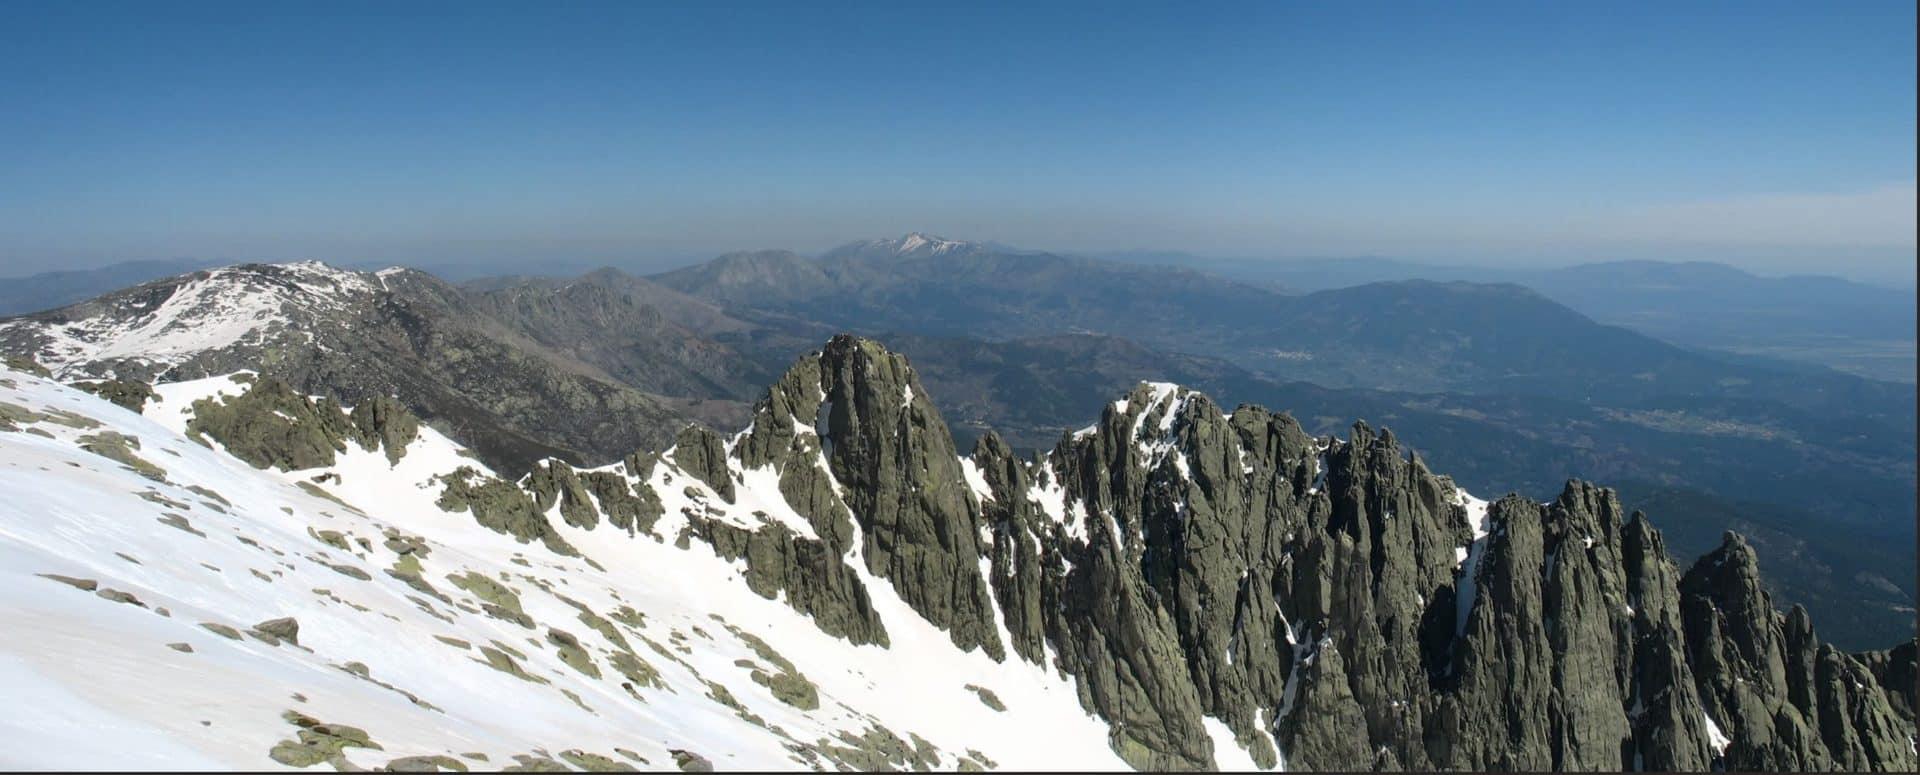 1-day hike to La Mira Peak summit in Gredos